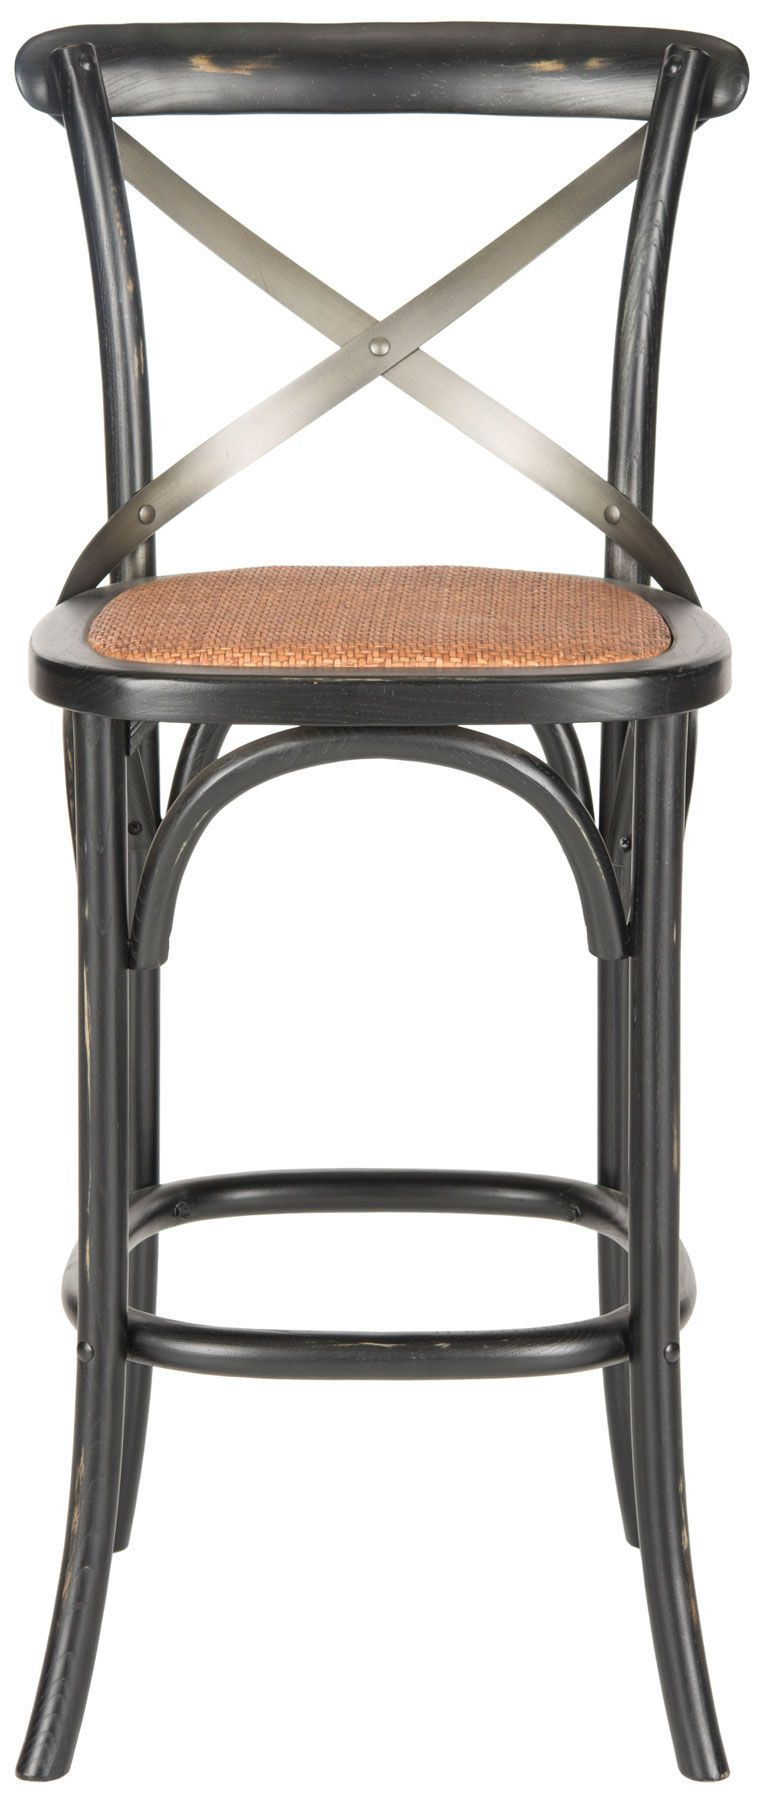 Amhb bar stools furniture by pinterest bar stool sofa